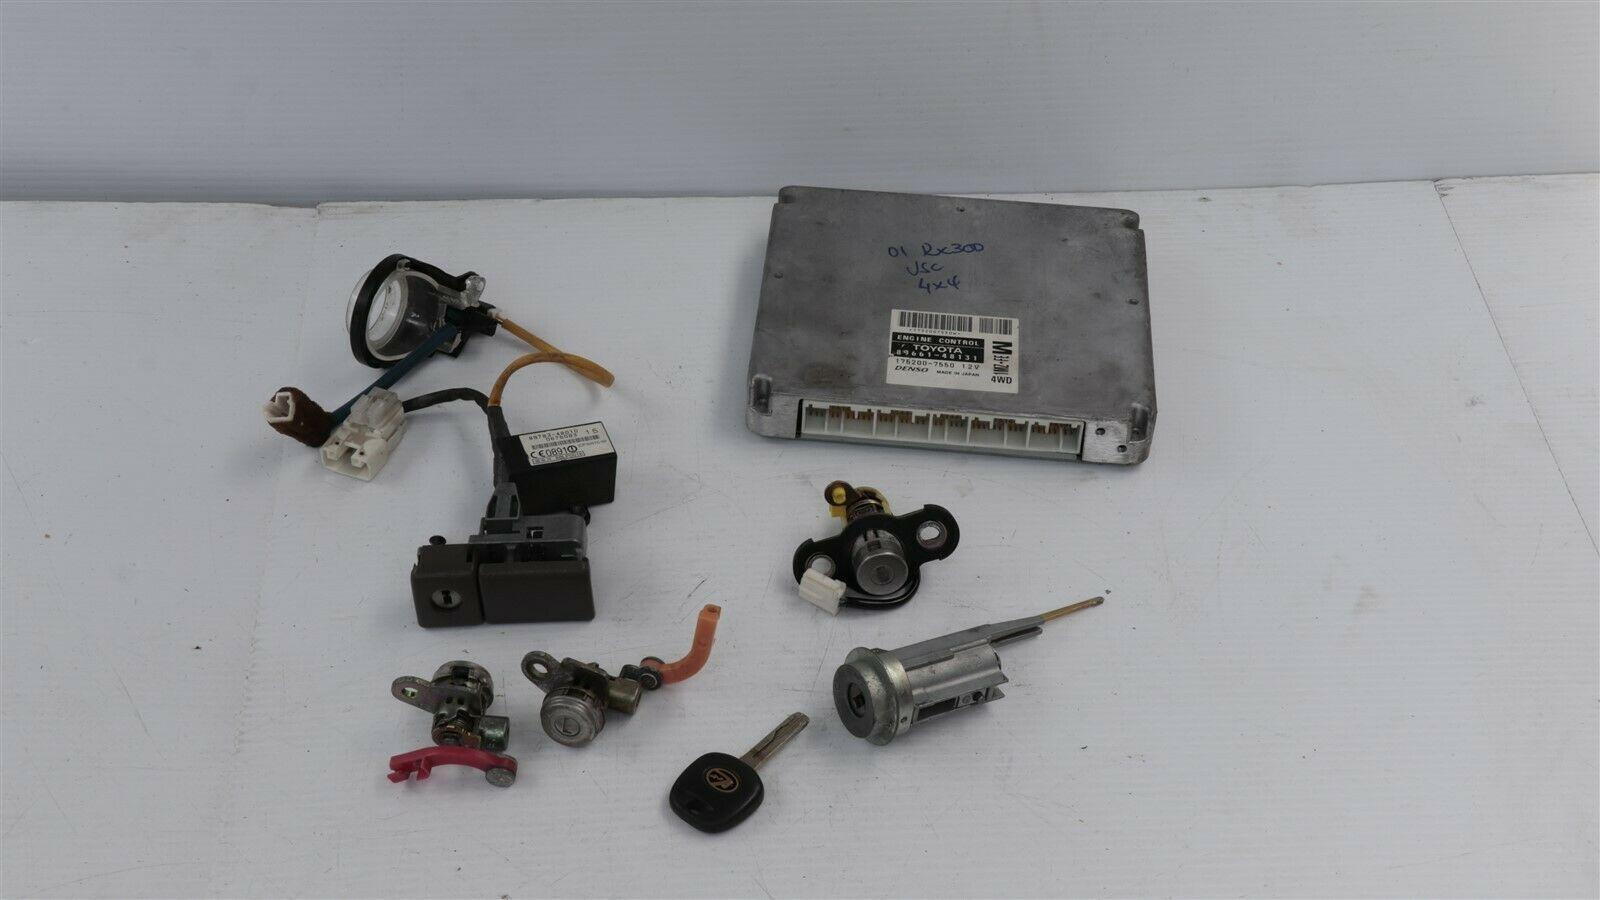 2003 Lexus RX330 4wd ECU Immo Ignition Door Trunk Glovebox Lock Fob Combo Set